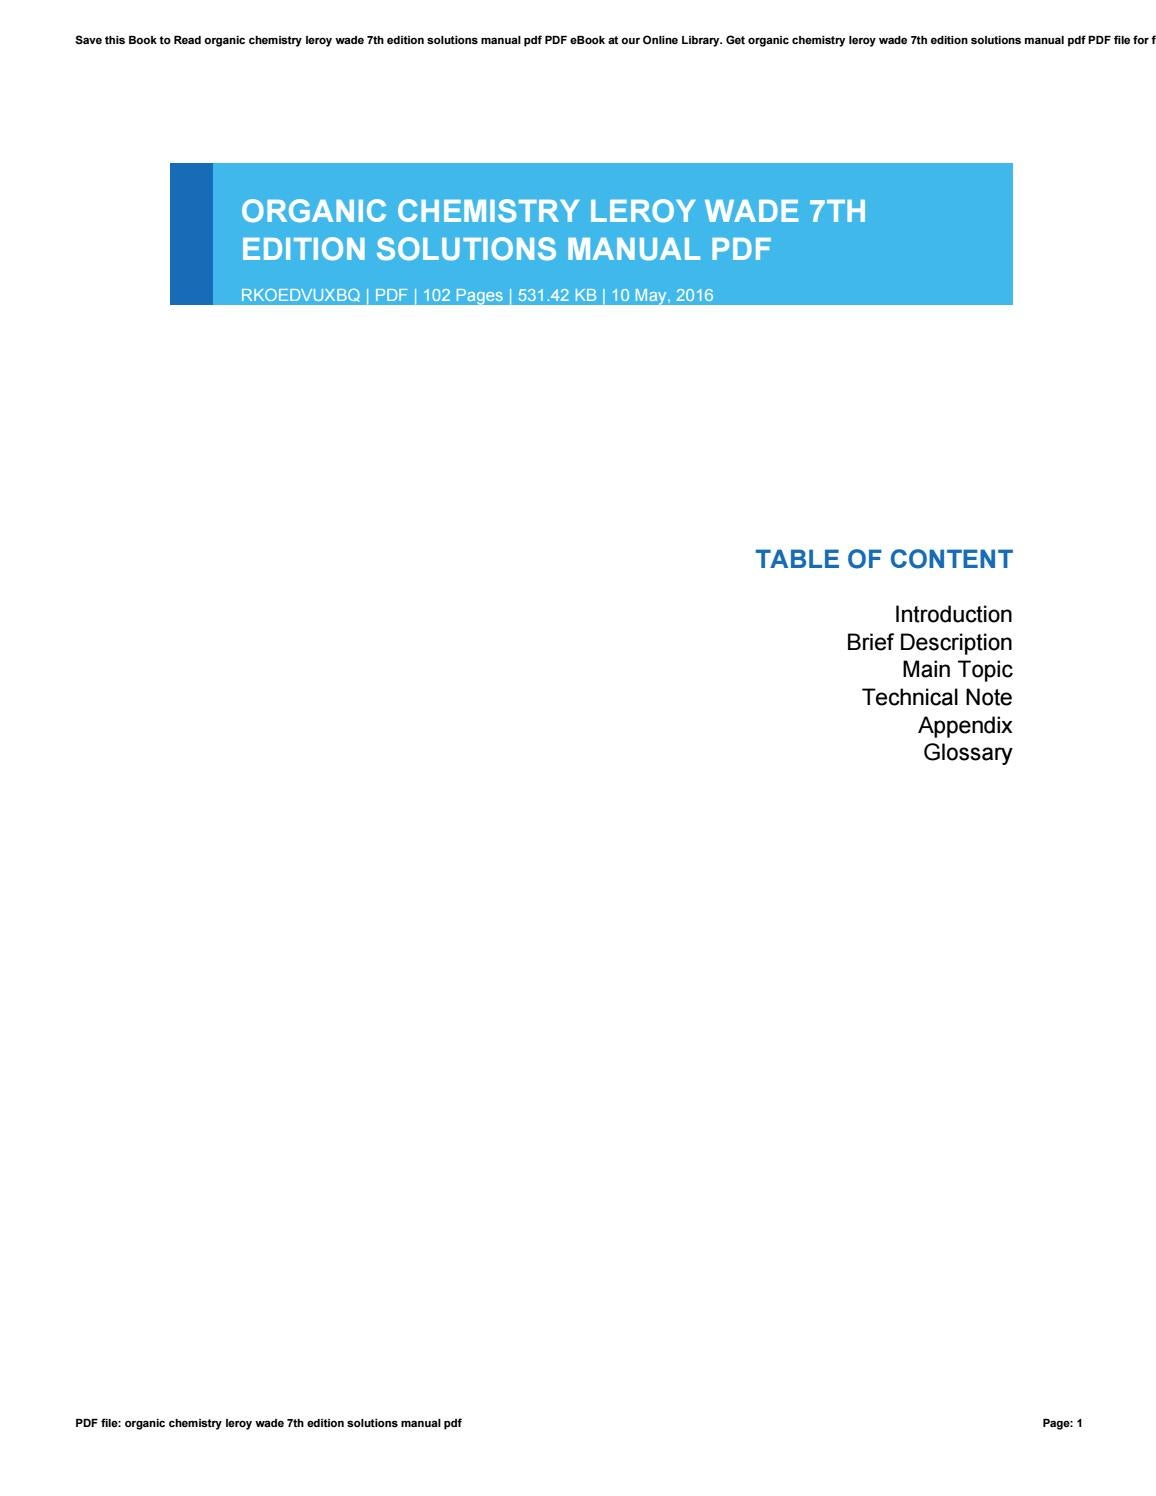 Organic chemistry leroy wade 7th edition solutions manual pdf by  GeraldineMcKinney3824 - issuu